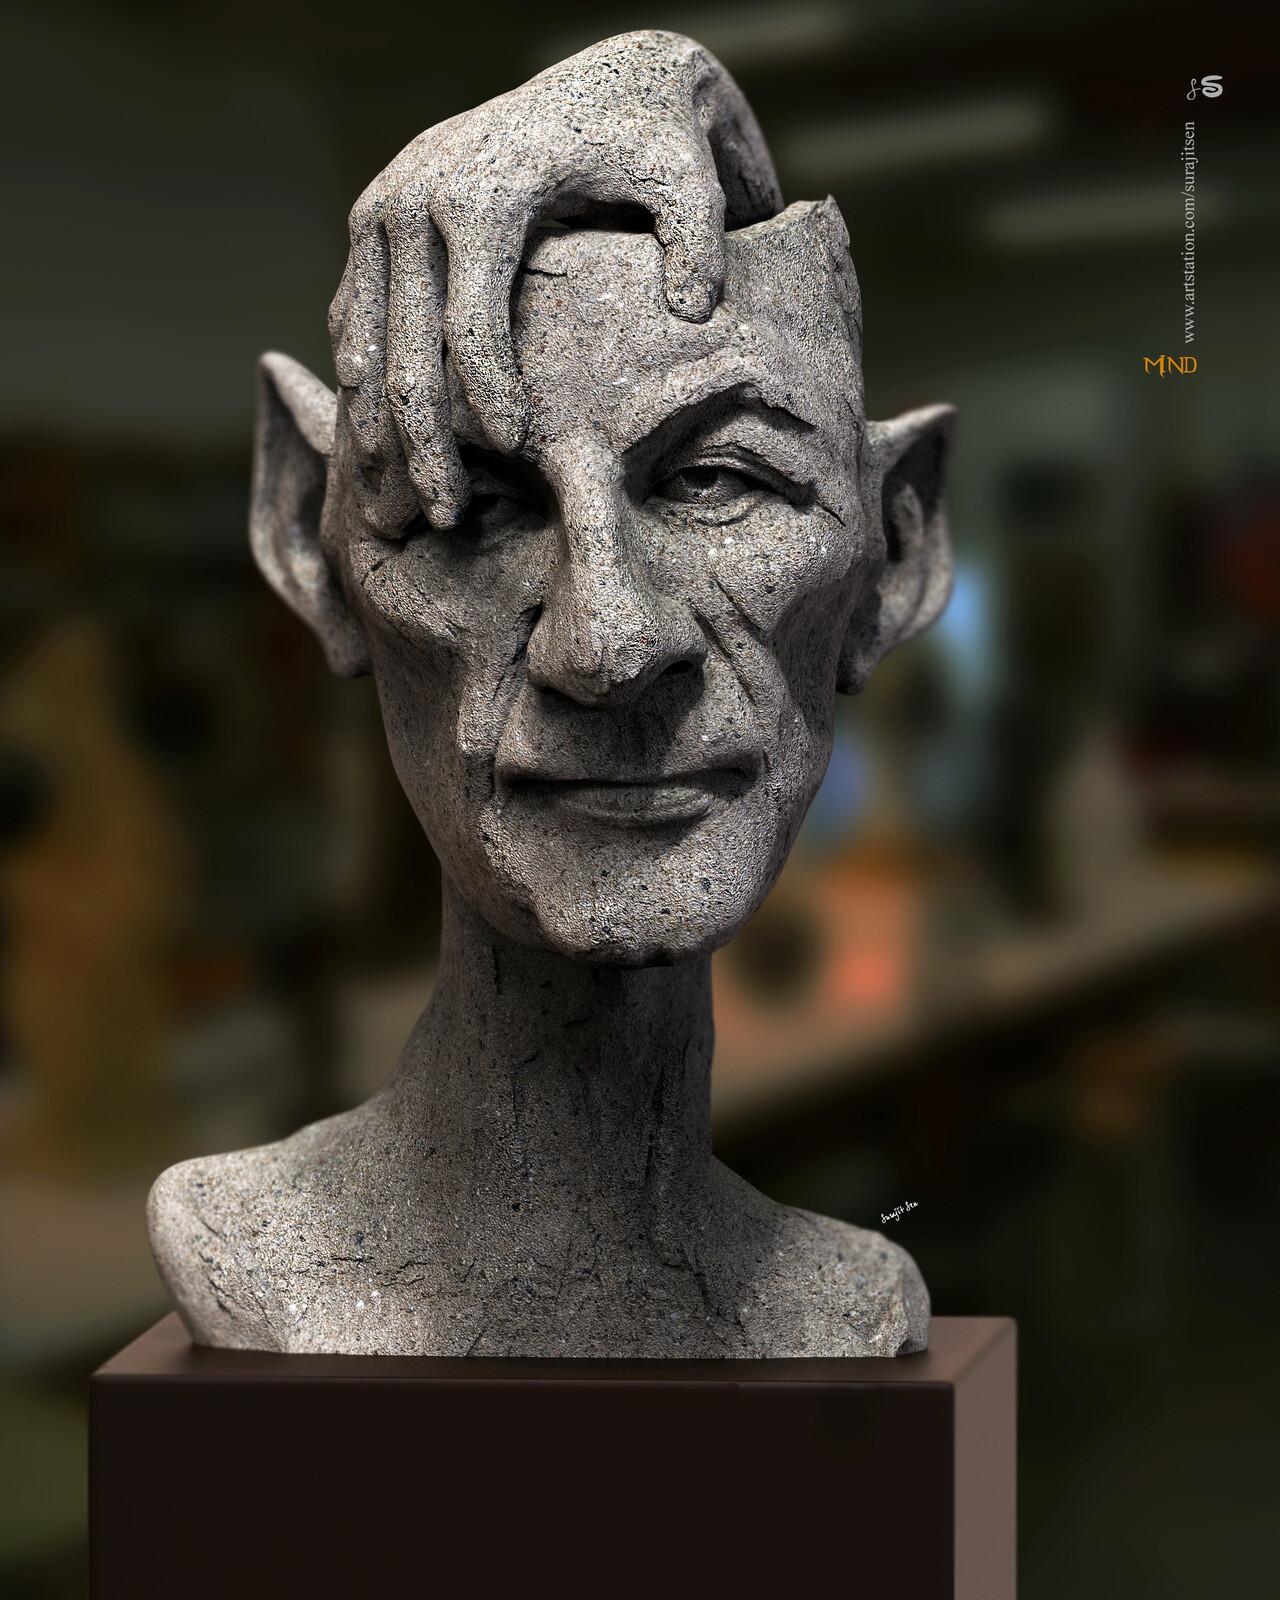 Mind1.0 Digital Sculpture.